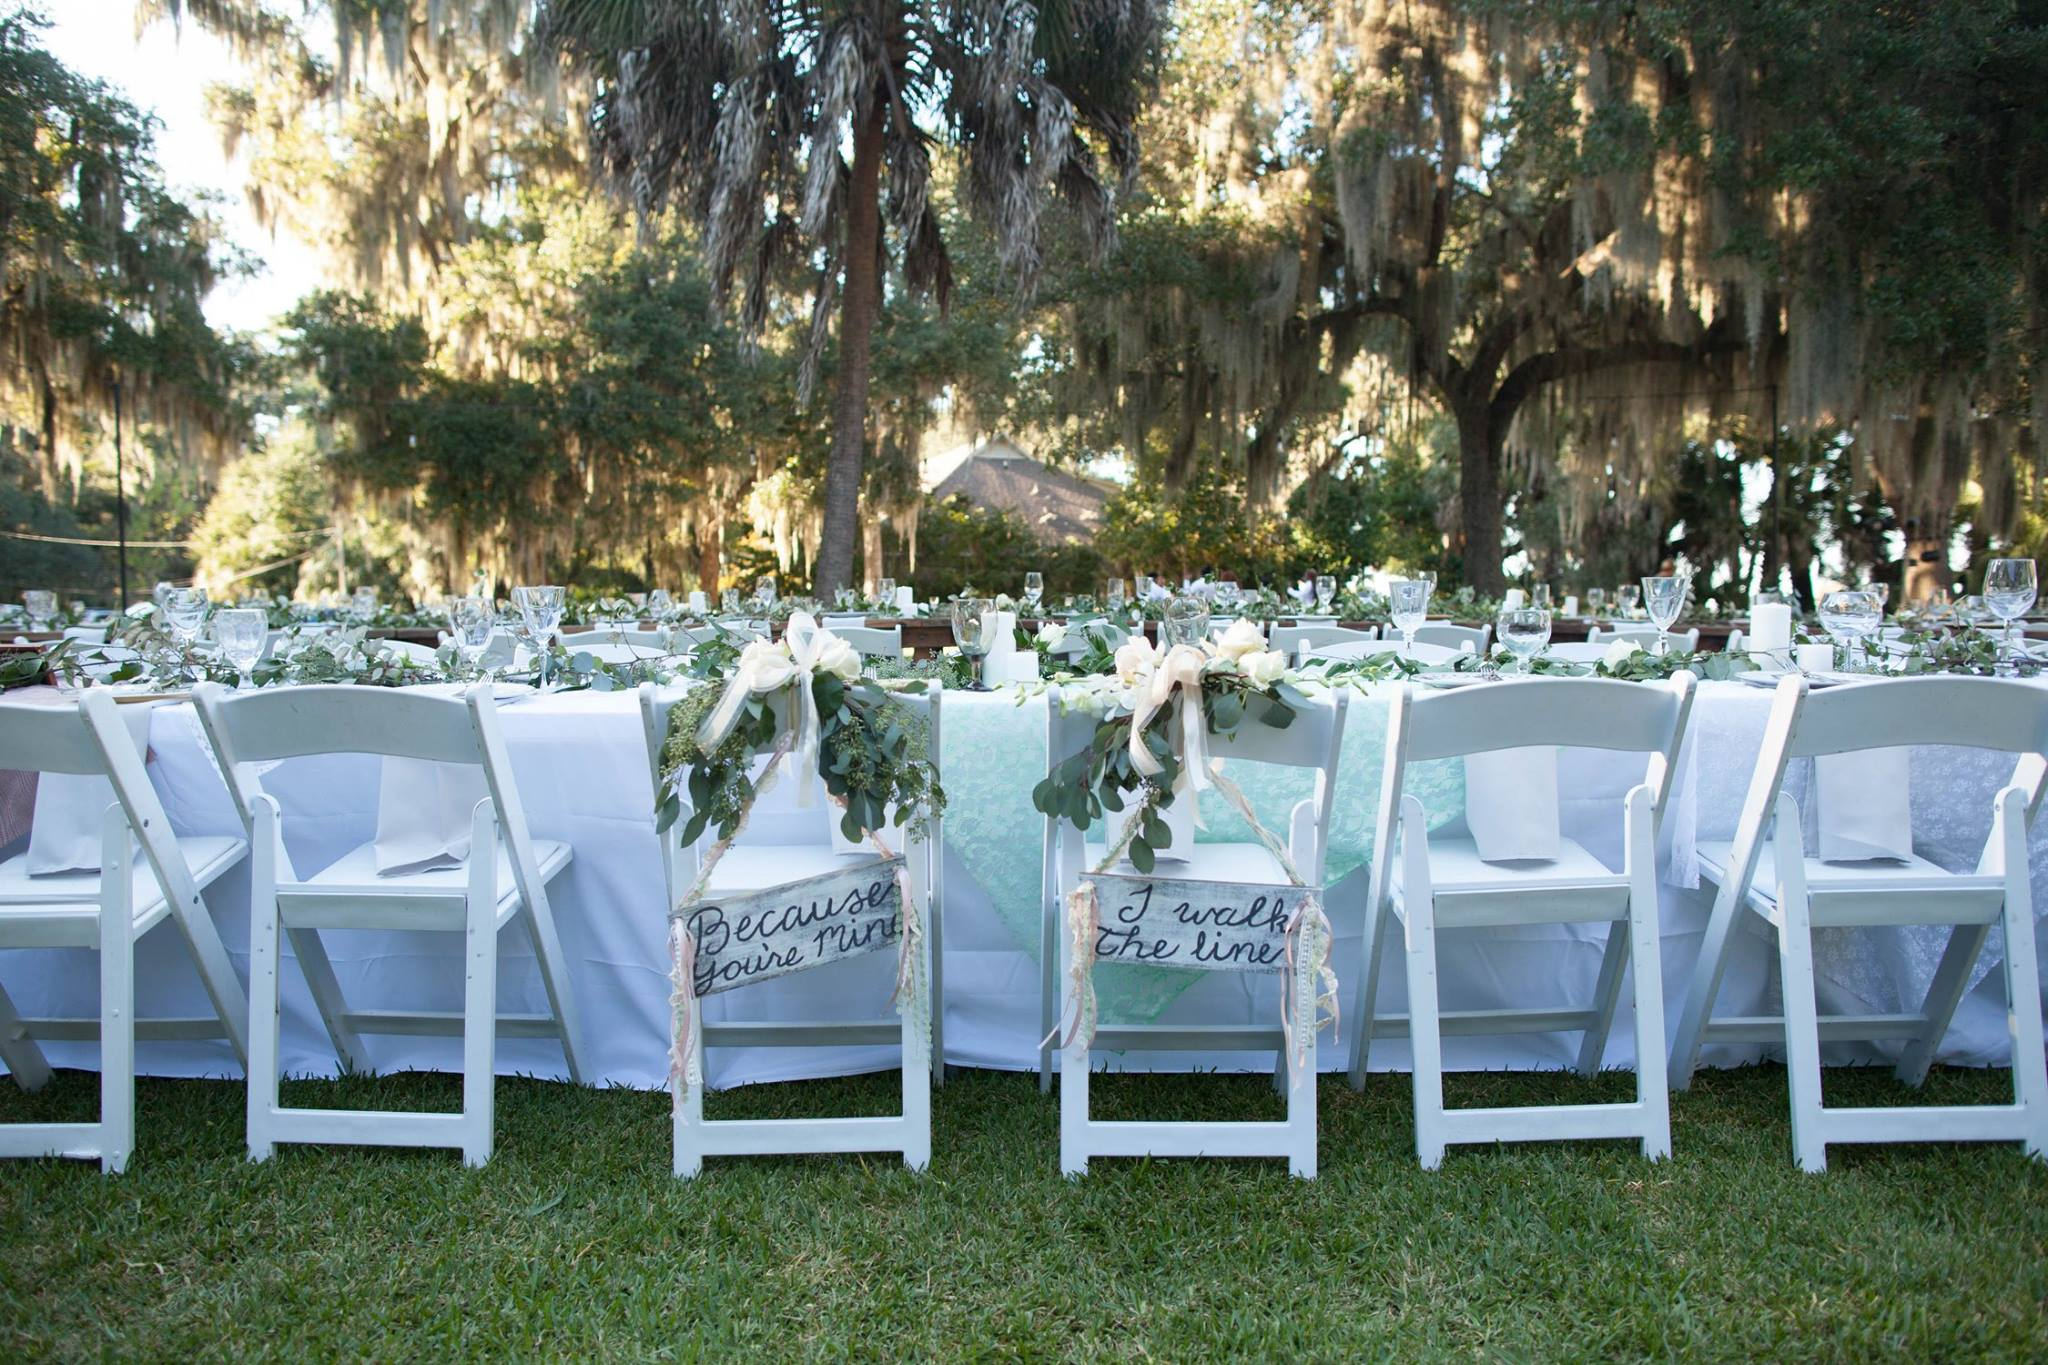 lindy-garvin-rebecca-schoneveld-vivian-sage-blush-wedding-dress-blush-bridal-gown-handmade-wedding-dress-ivory-and-beau-bridal-boutique-savannah-wedding-dresses-savannah-bridal-boutique-savannah-weddings-savannah-brides-jacksonville-bridal-boutique-17.jpg